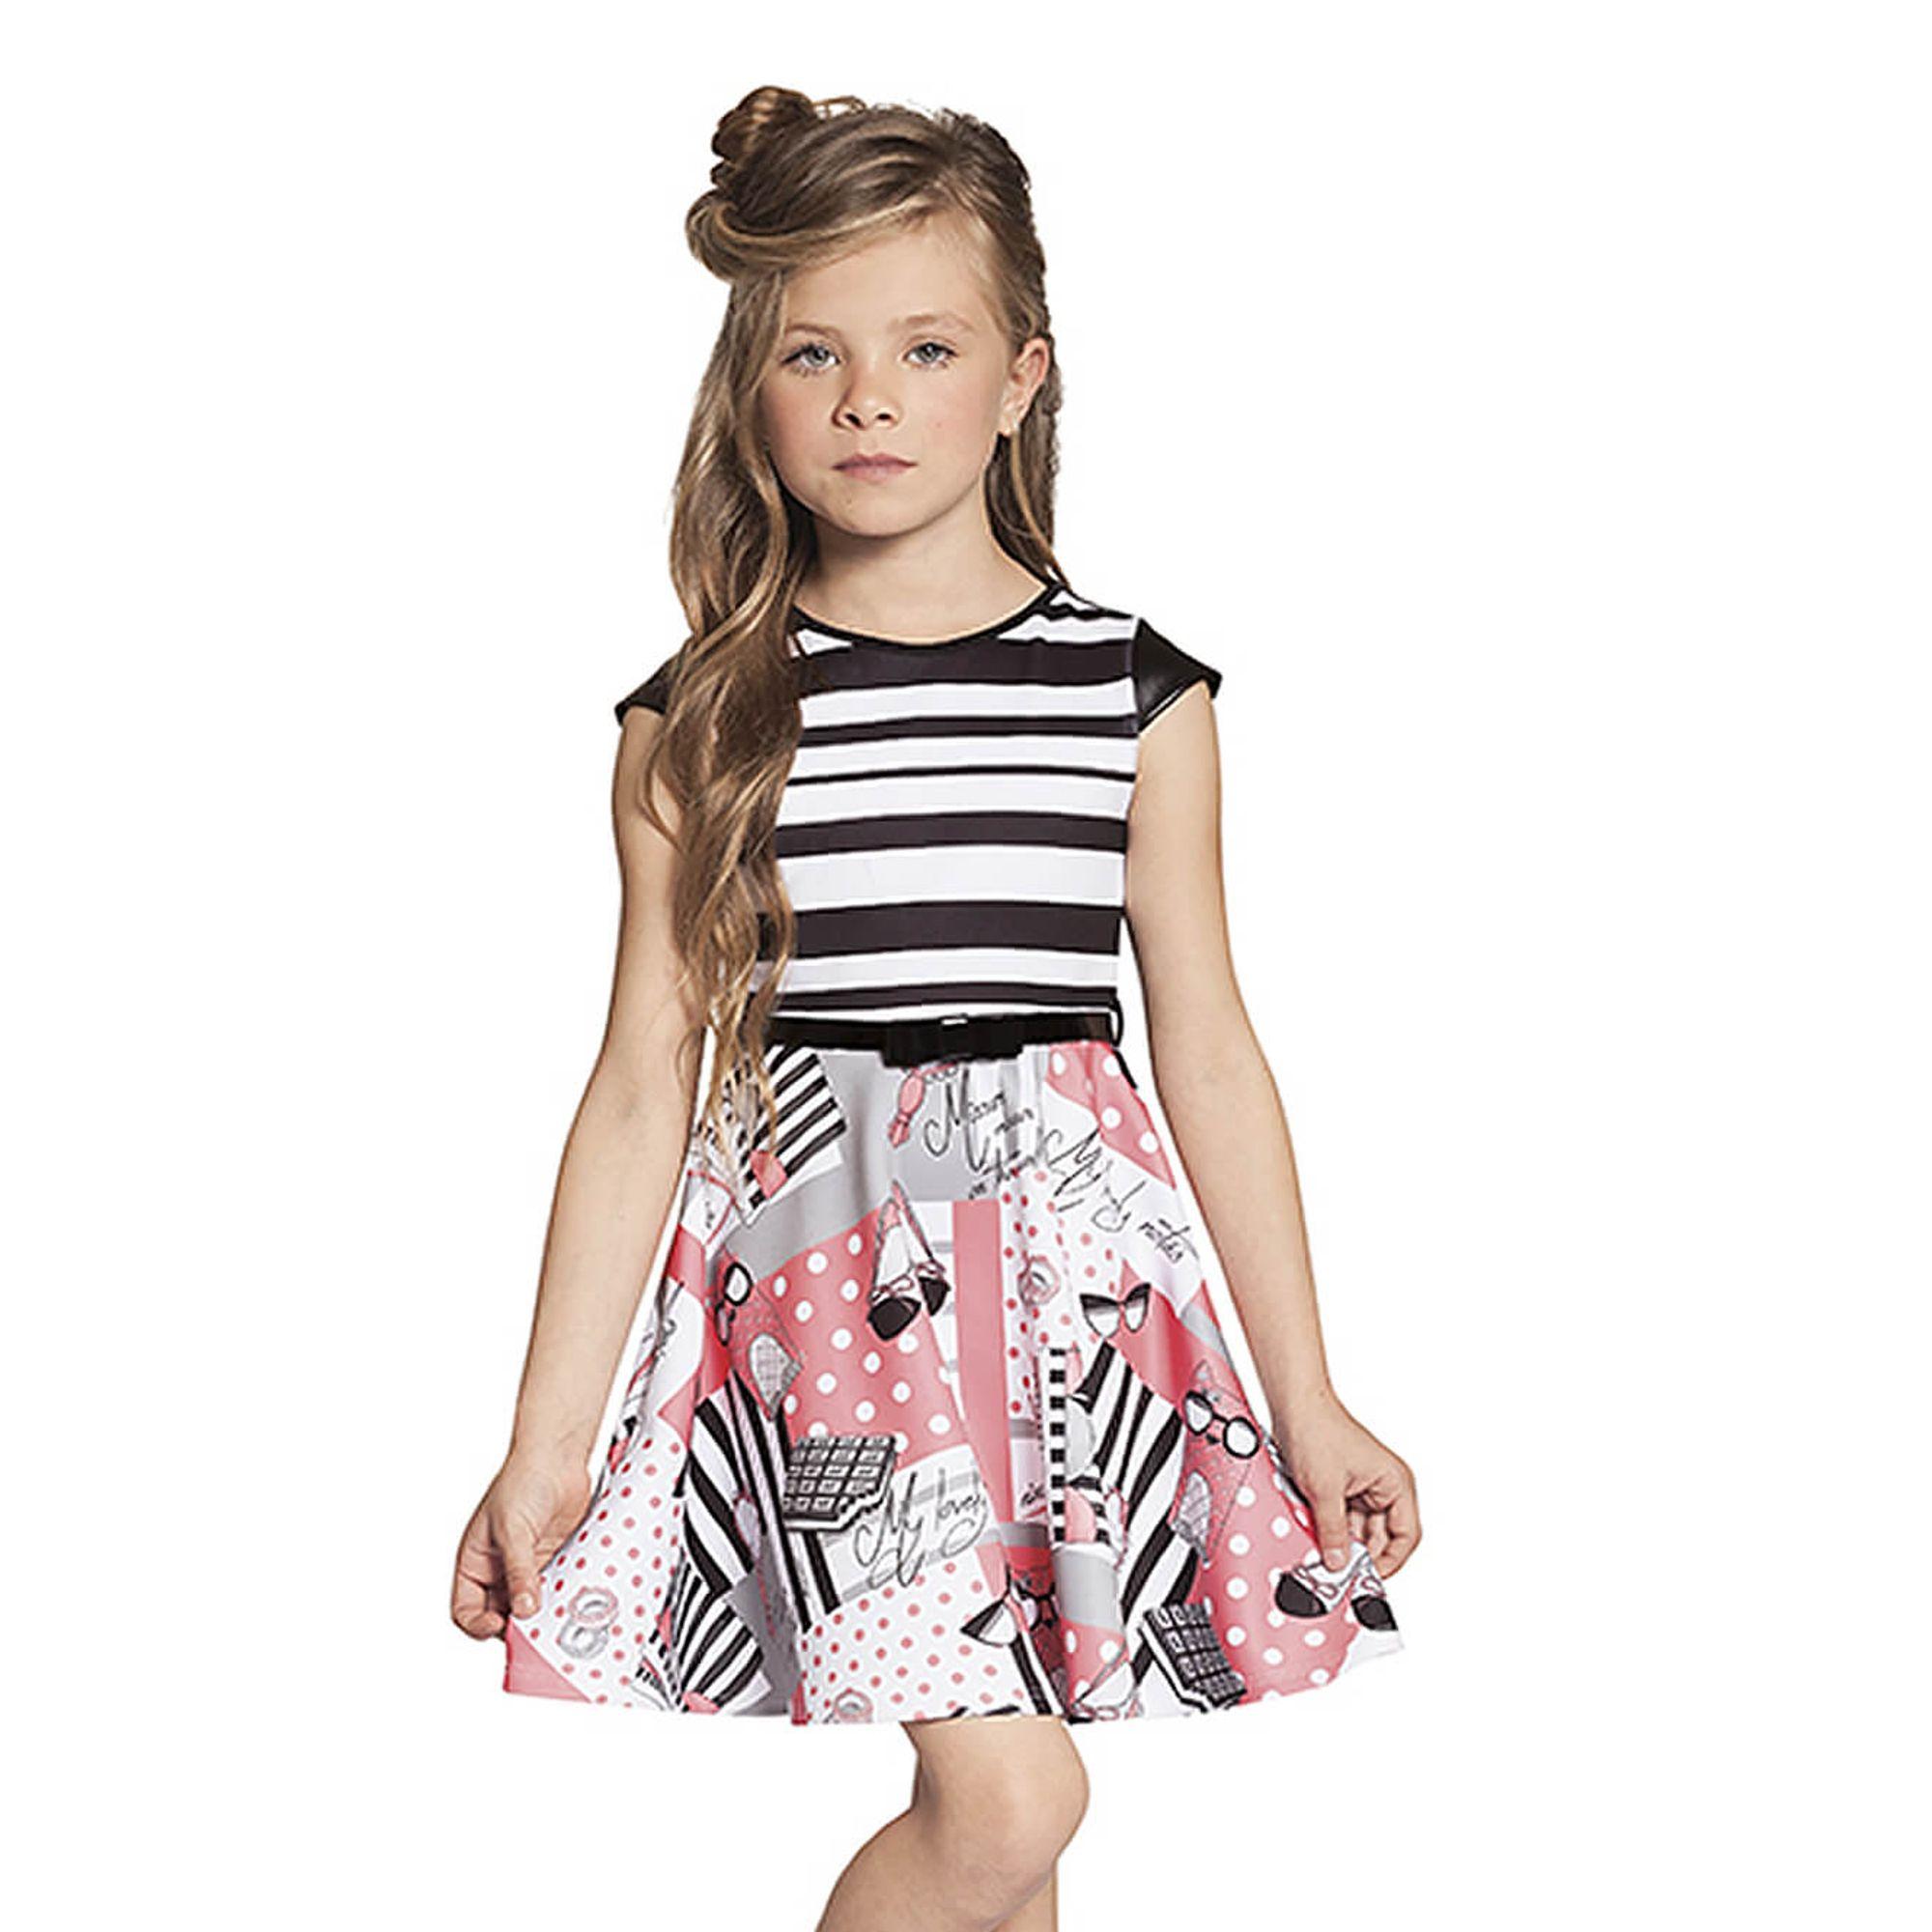 4325805568dc Vestido Infantil Neoprene Listras Black & White e Saia Rodada Estampada  Ninali